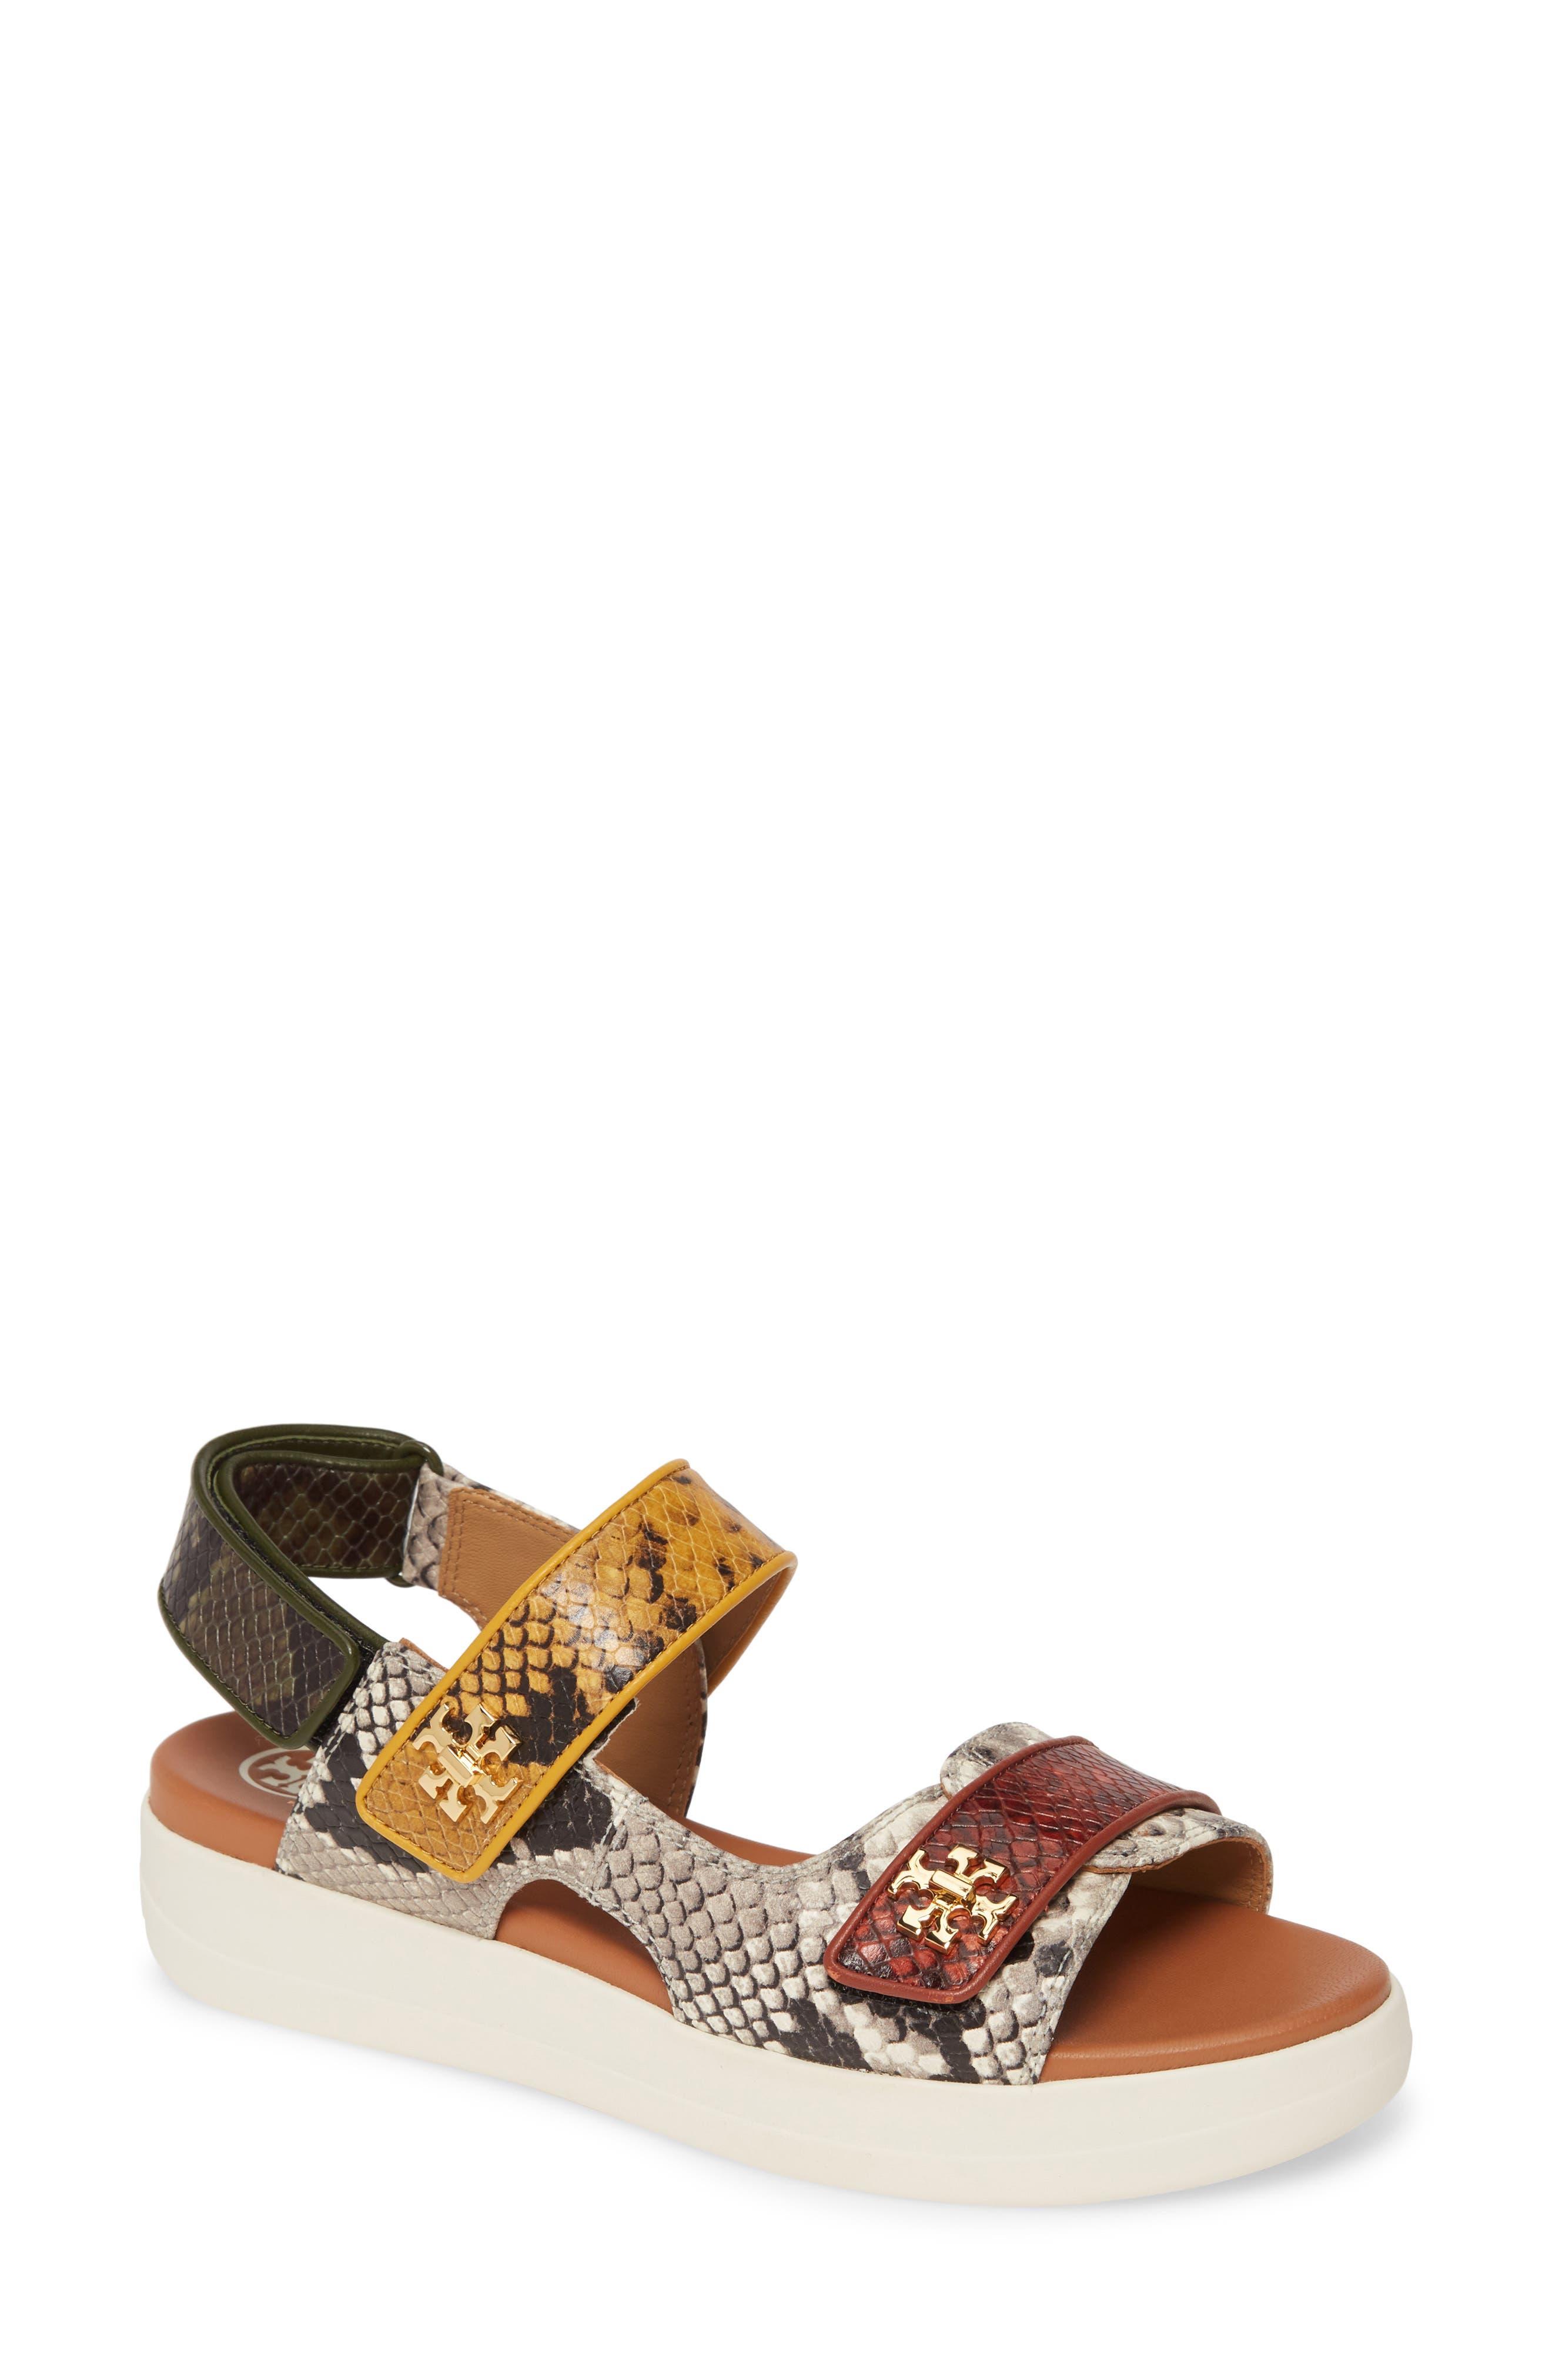 Tory Burch Sandals Kira Sport Sandal